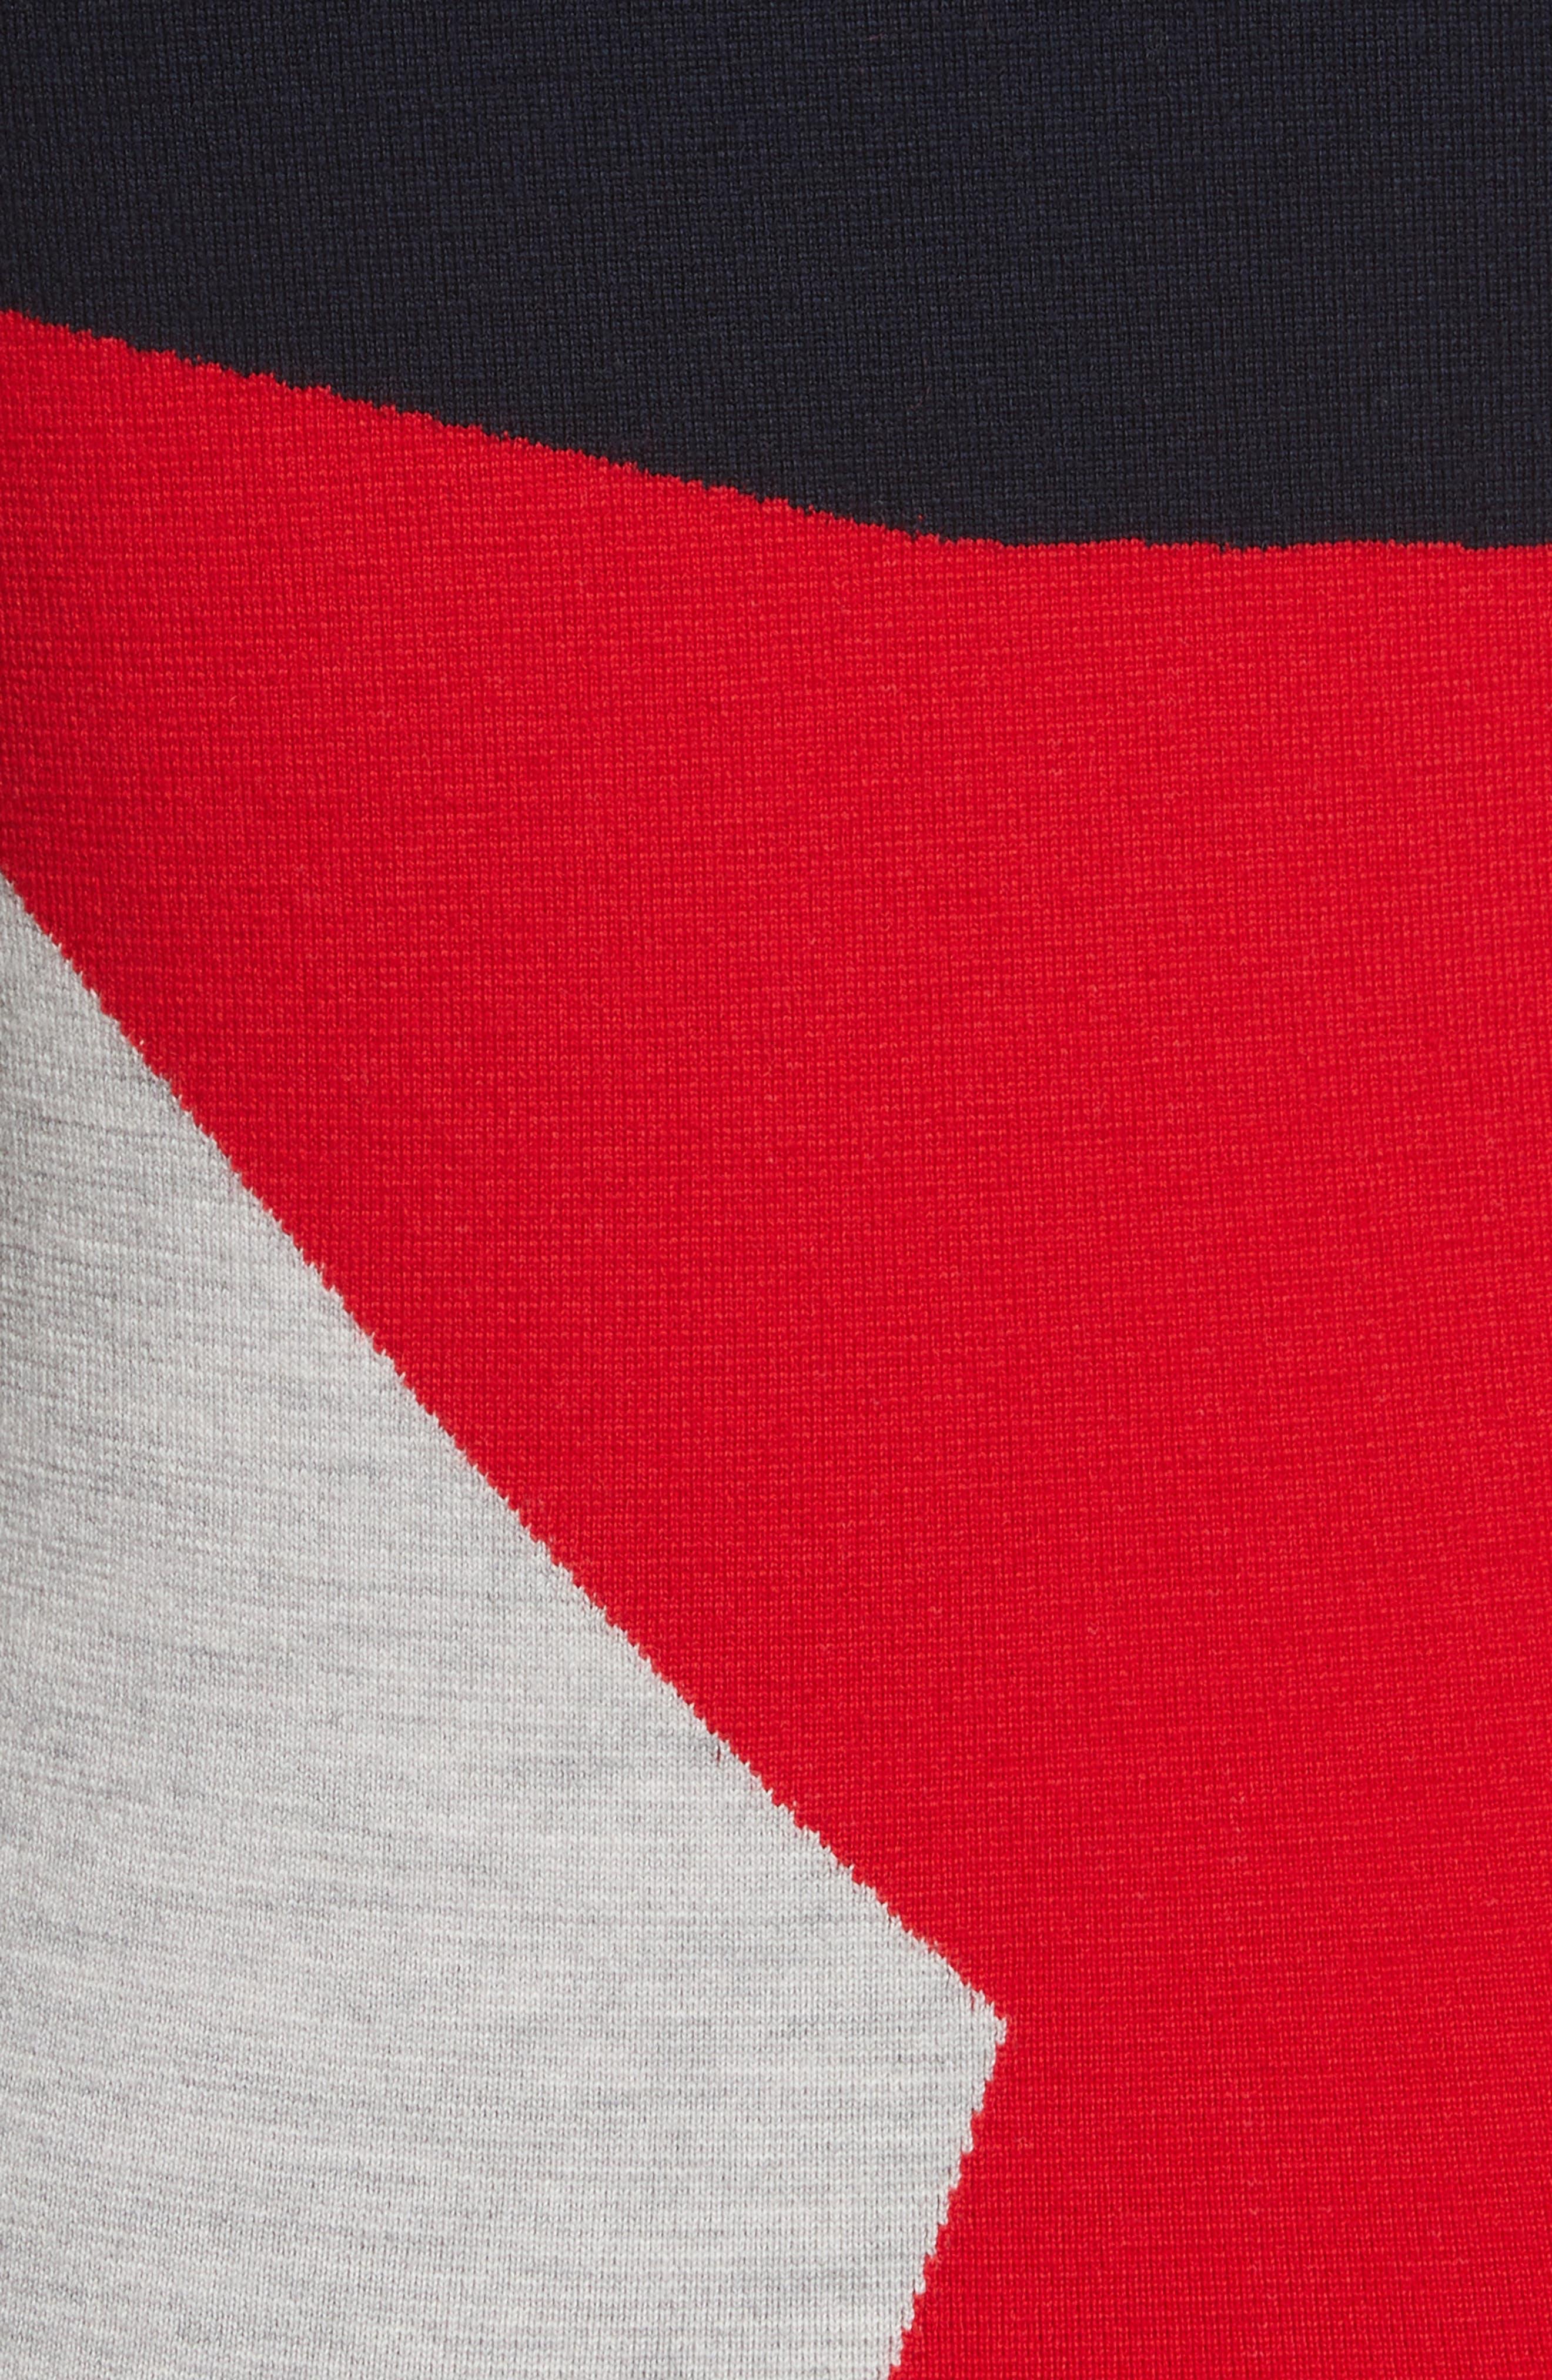 Diane von Furstenberg Colorblock Turtleneck Pullover,                             Alternate thumbnail 5, color,                             Lipstick Multi